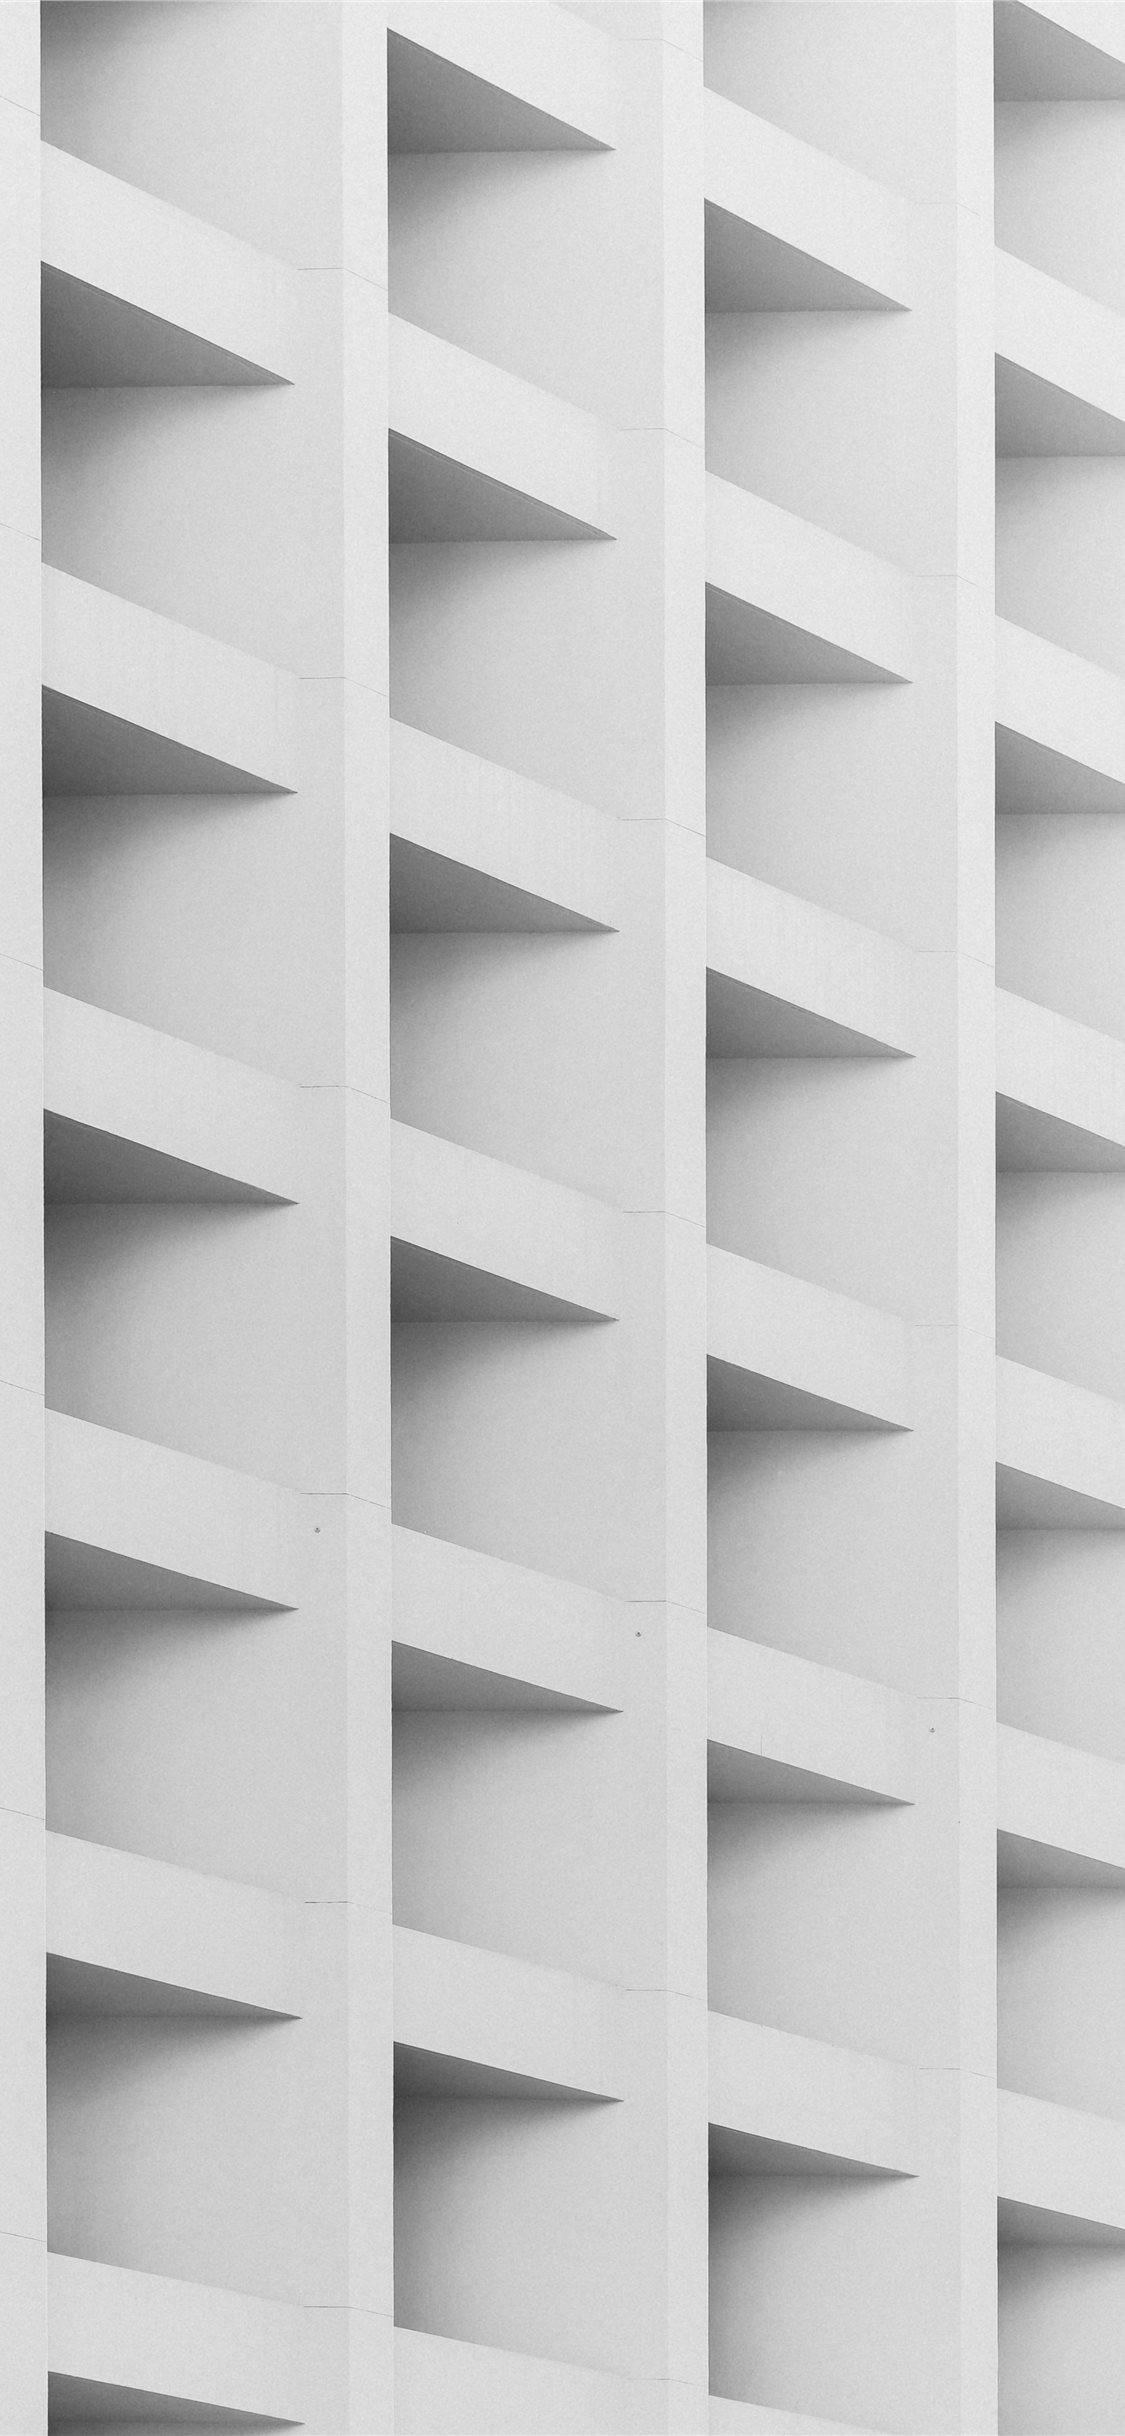 Parallelogram Iphone X Wallpapers Free Download